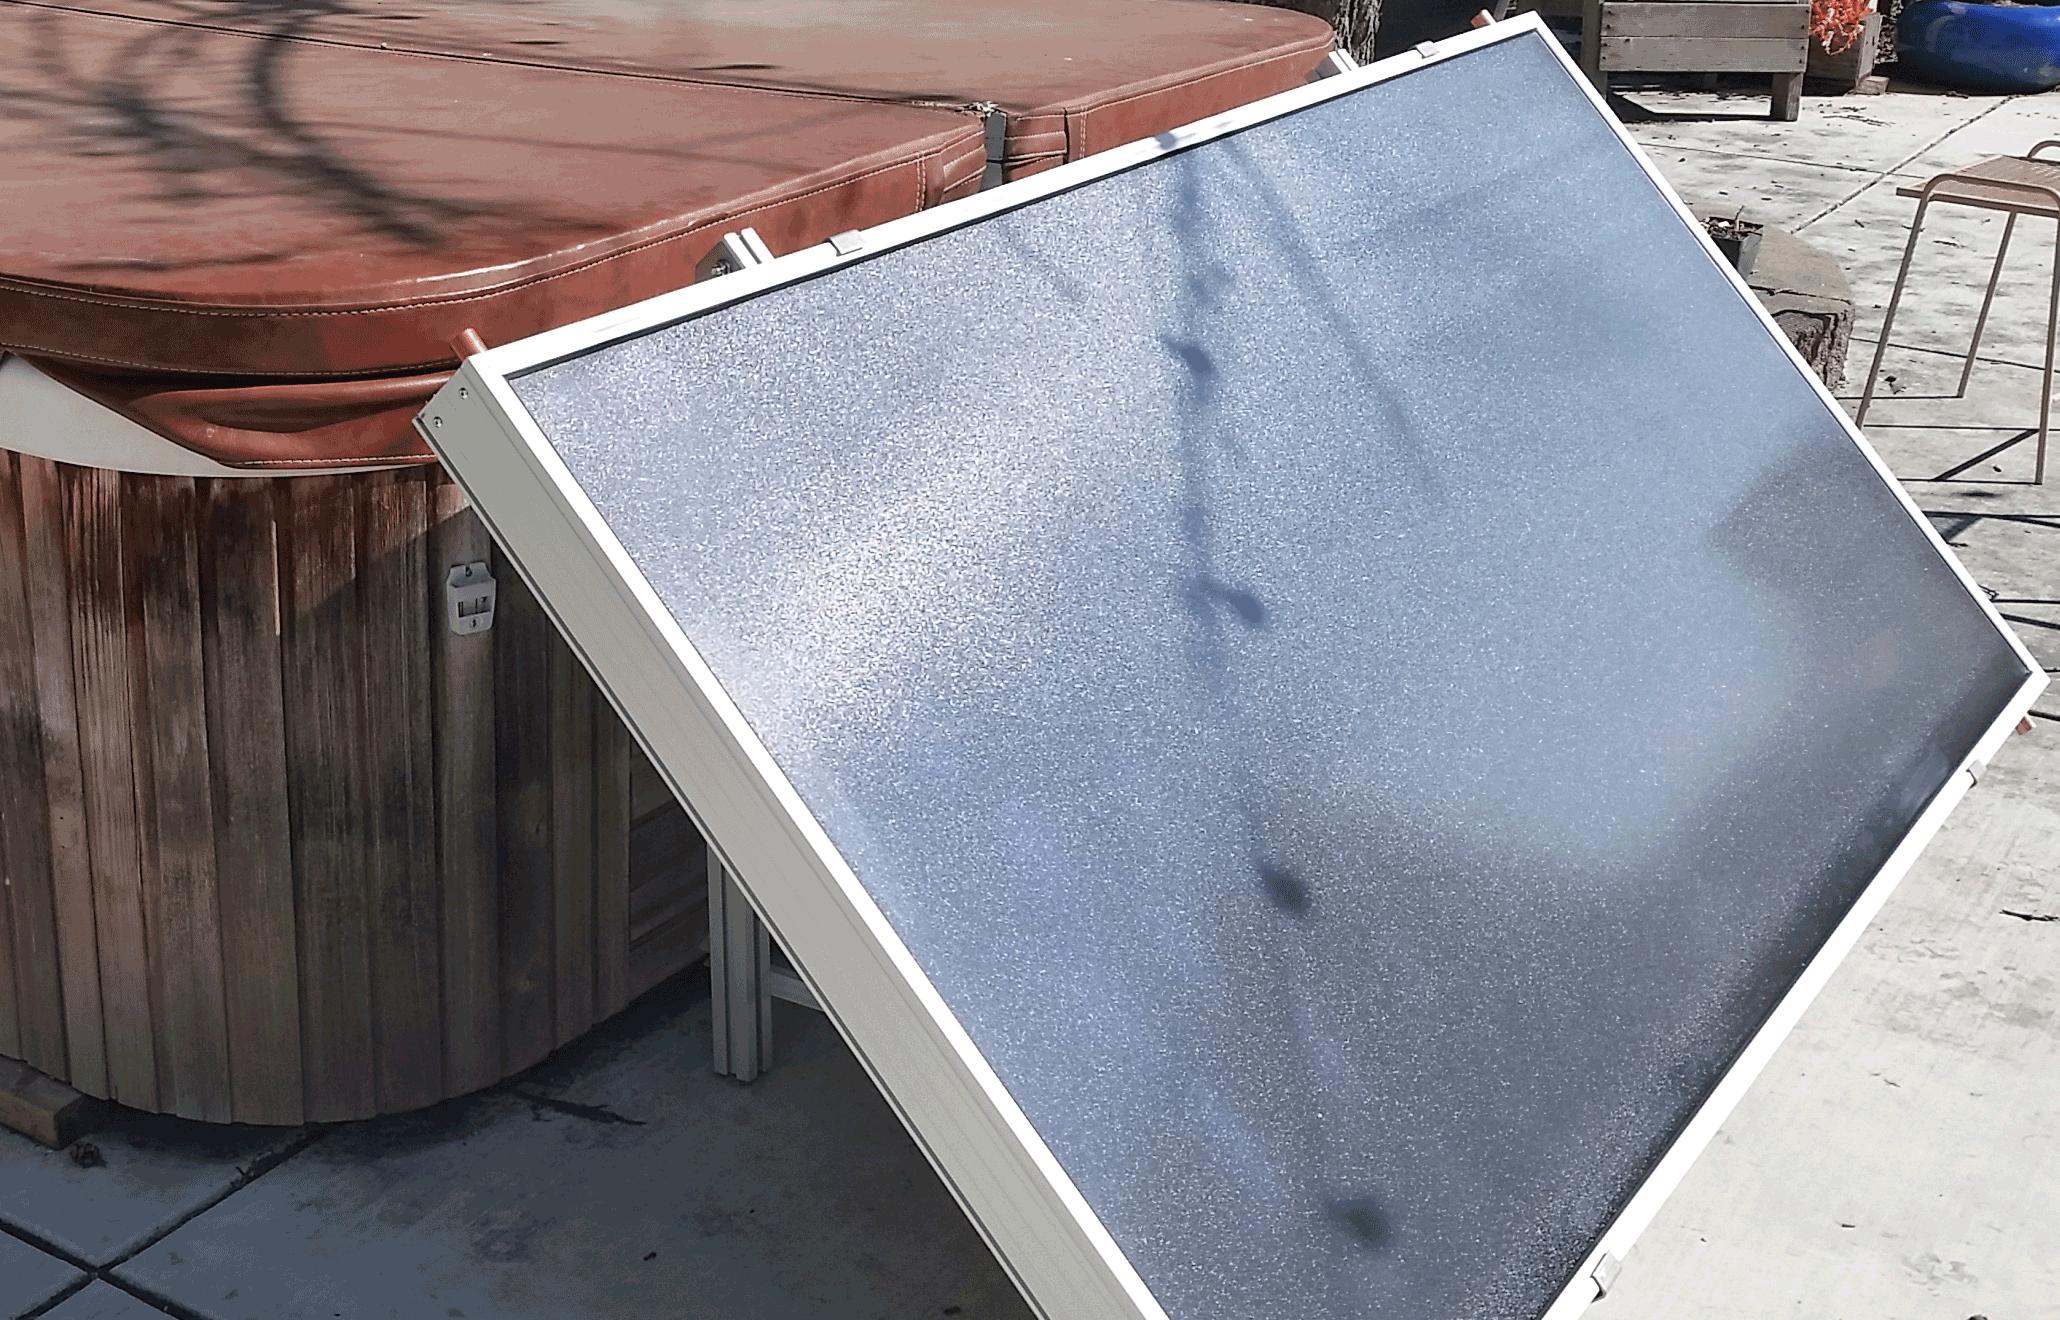 Installed solar hot tub kit